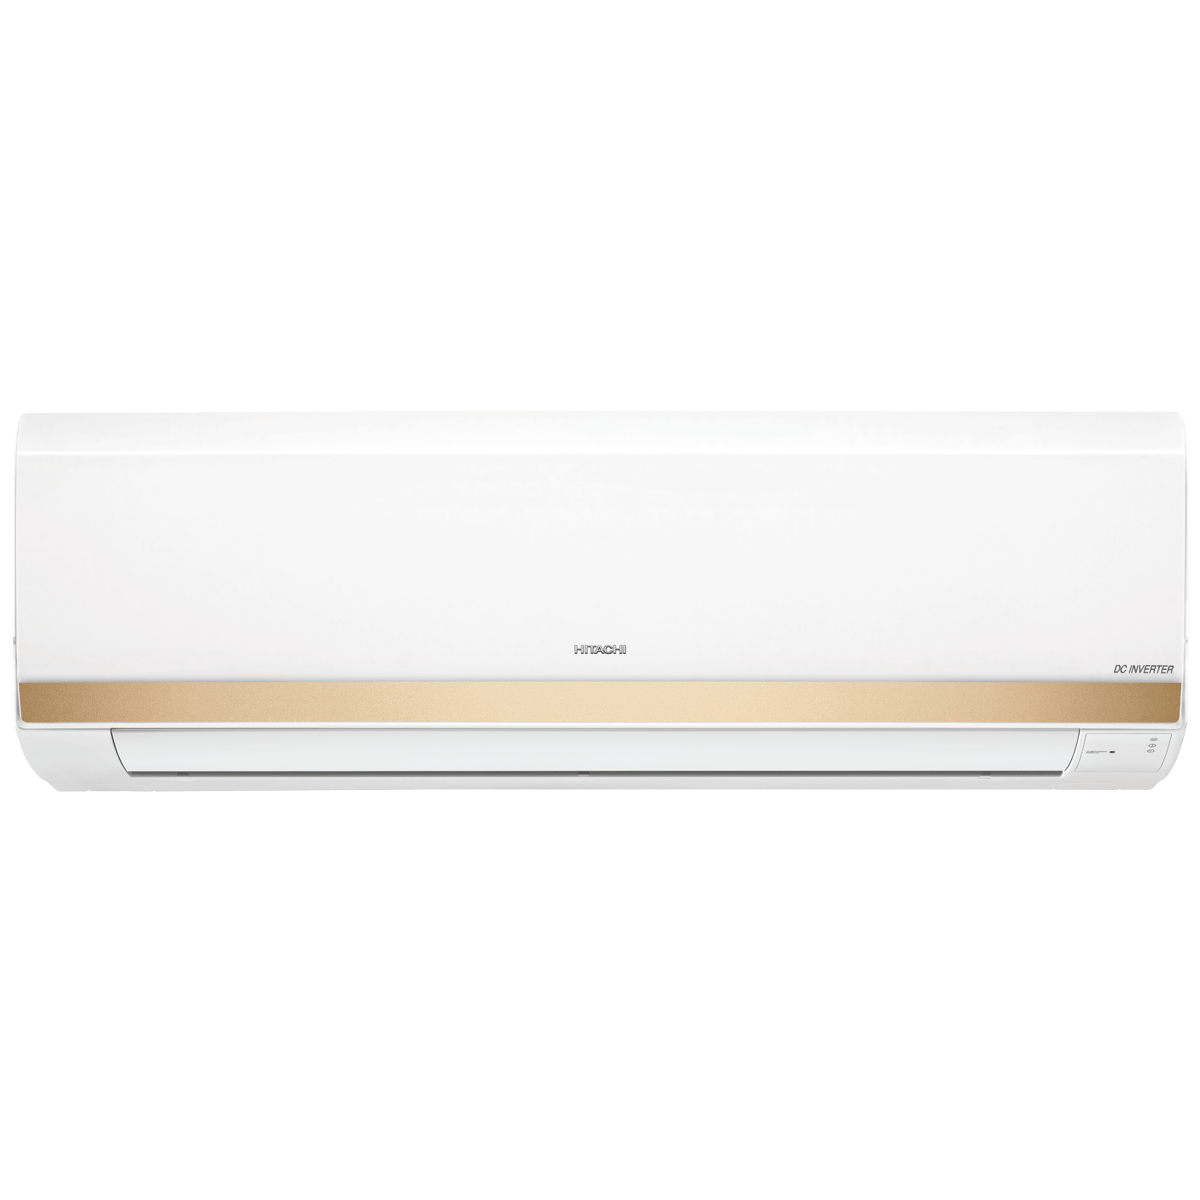 Hitachi Merai 3100S HP 2 Ton 3 Star Inverter Split AC (Hot & Cold, Copper Condenser, RMOG324HDXA, White)_1